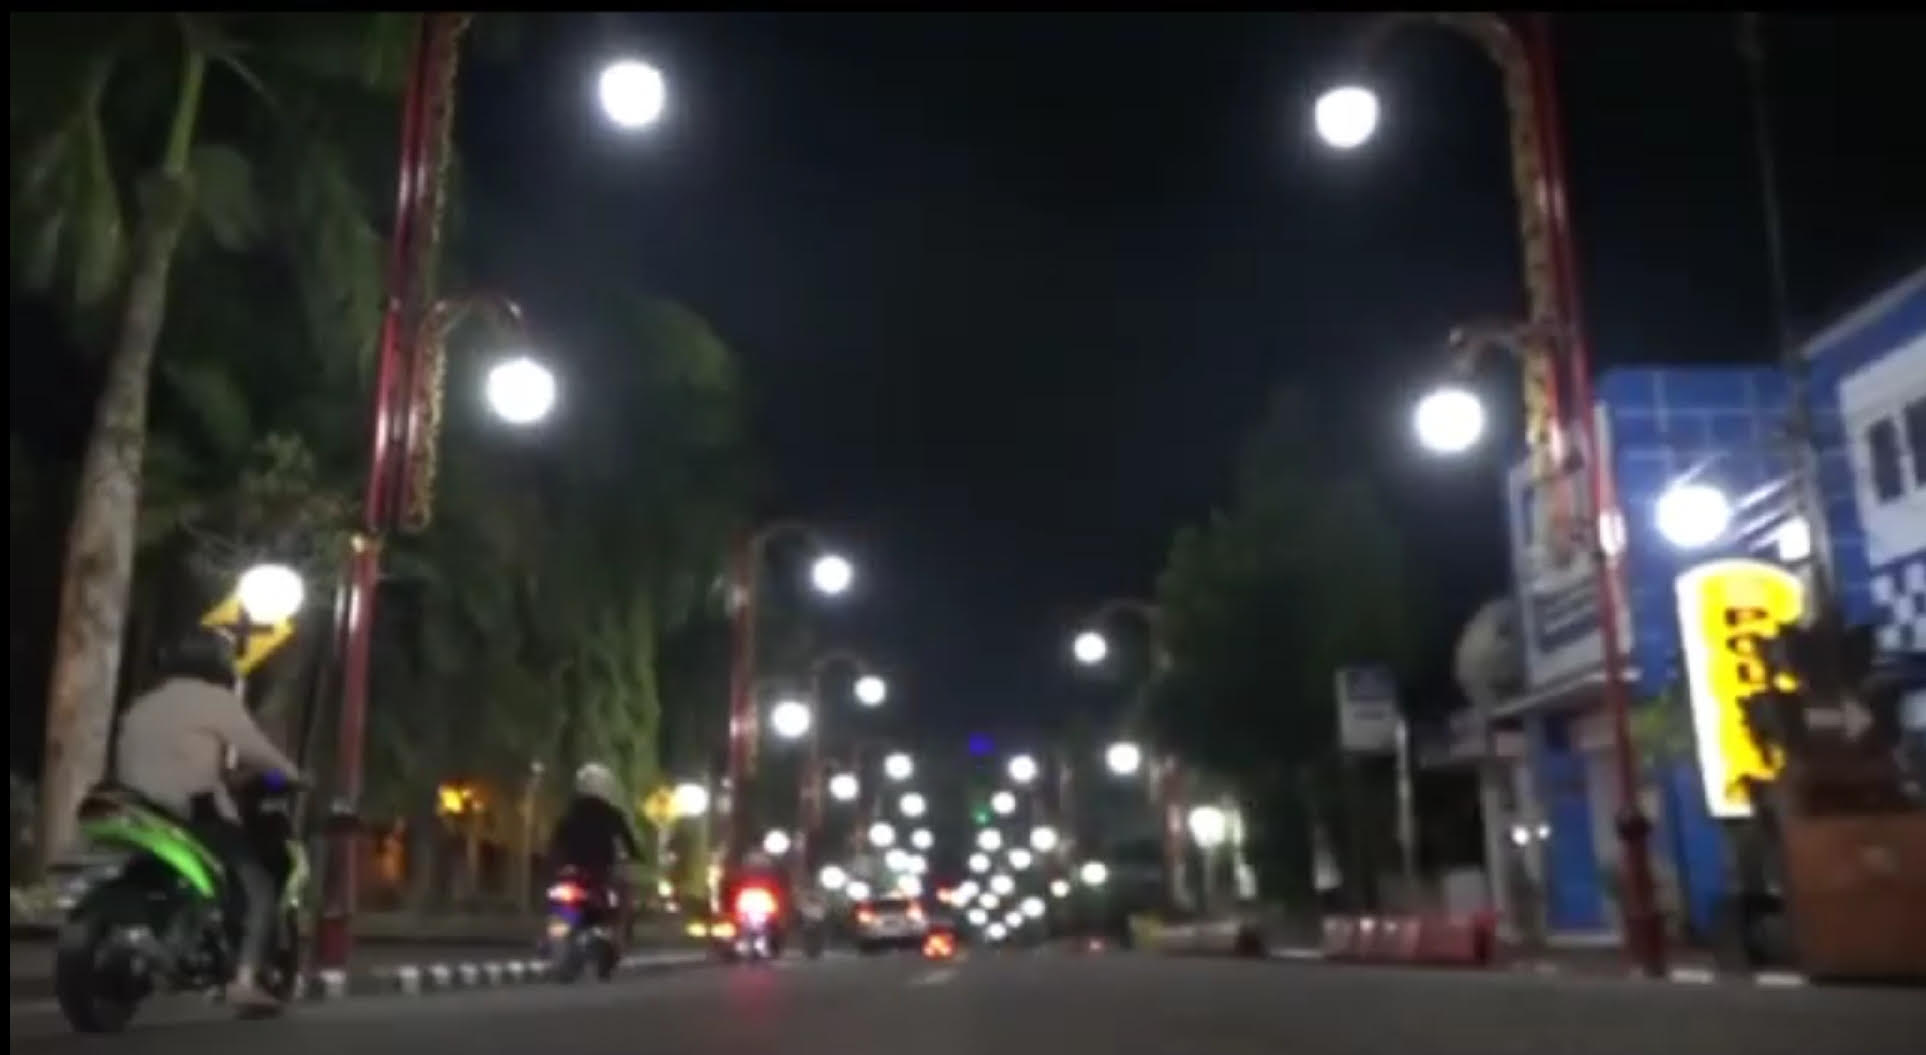 PEMKAB Gianyar menambah 230 lampu penerangan jalan untuk mempercantik Kota Gianyar pada malam hari. Foto: adi